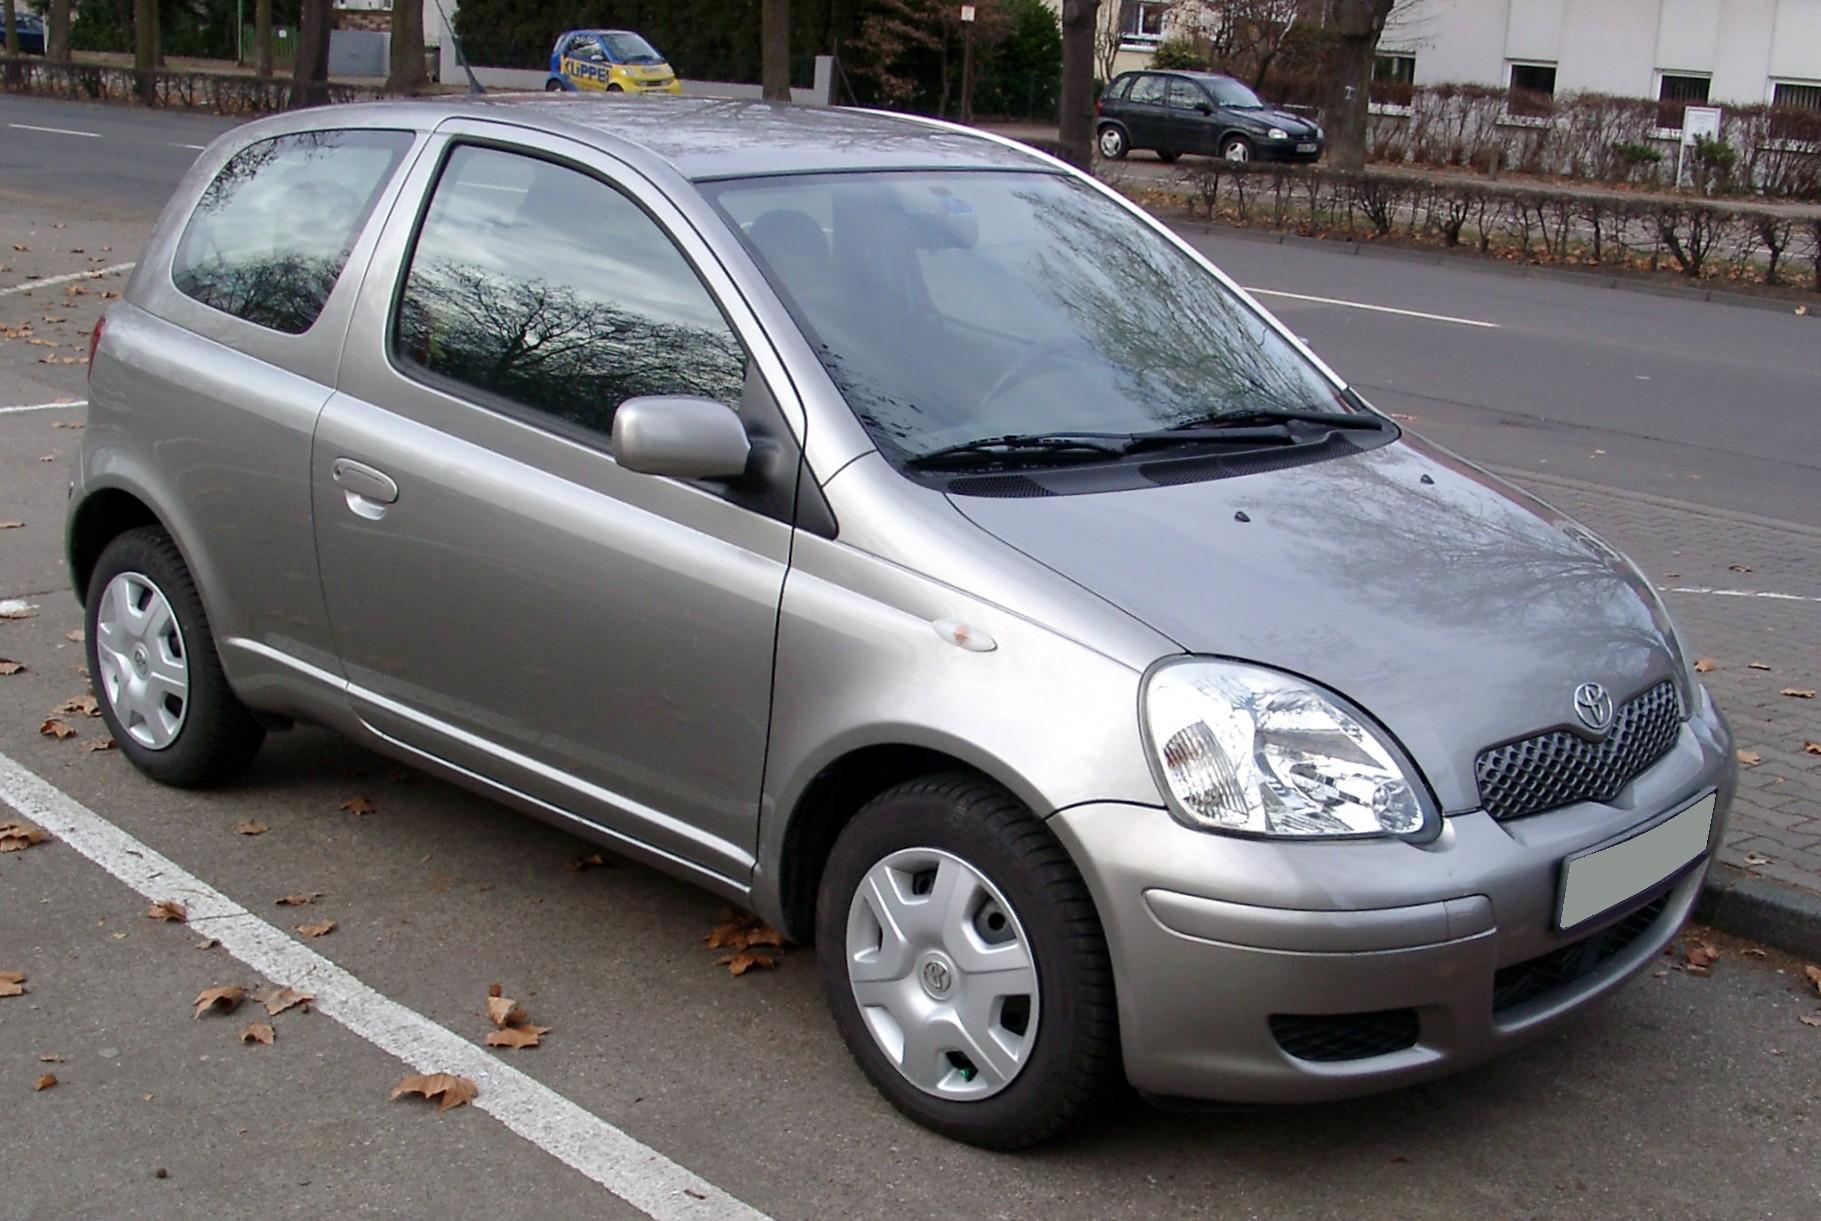 Toyota_Yaris_front_20080104